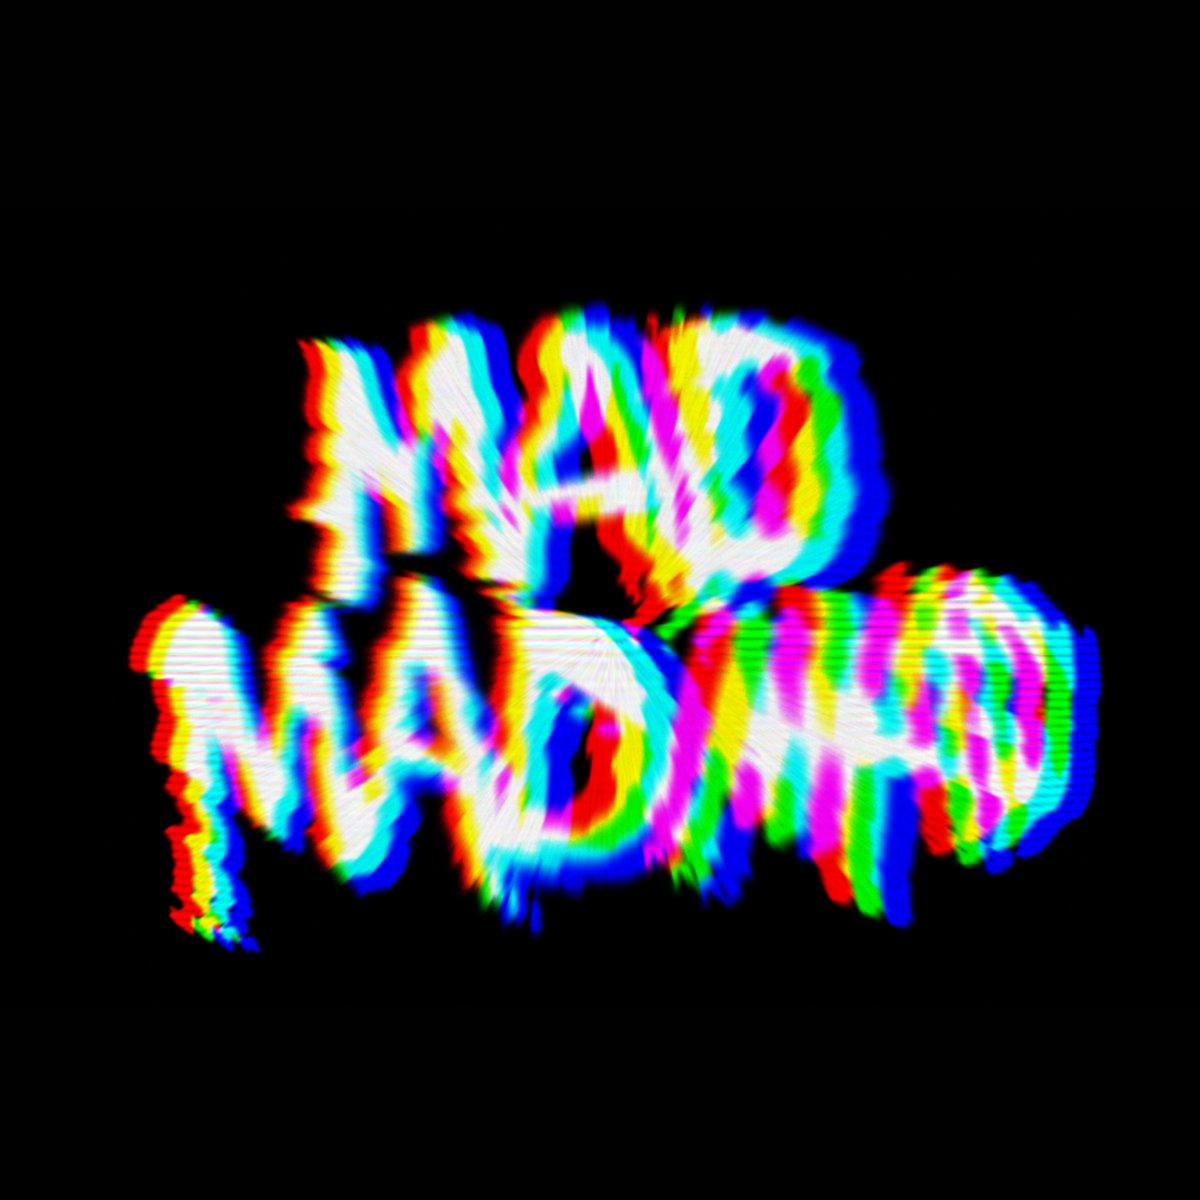 Twistedsoul - MADMADMAD